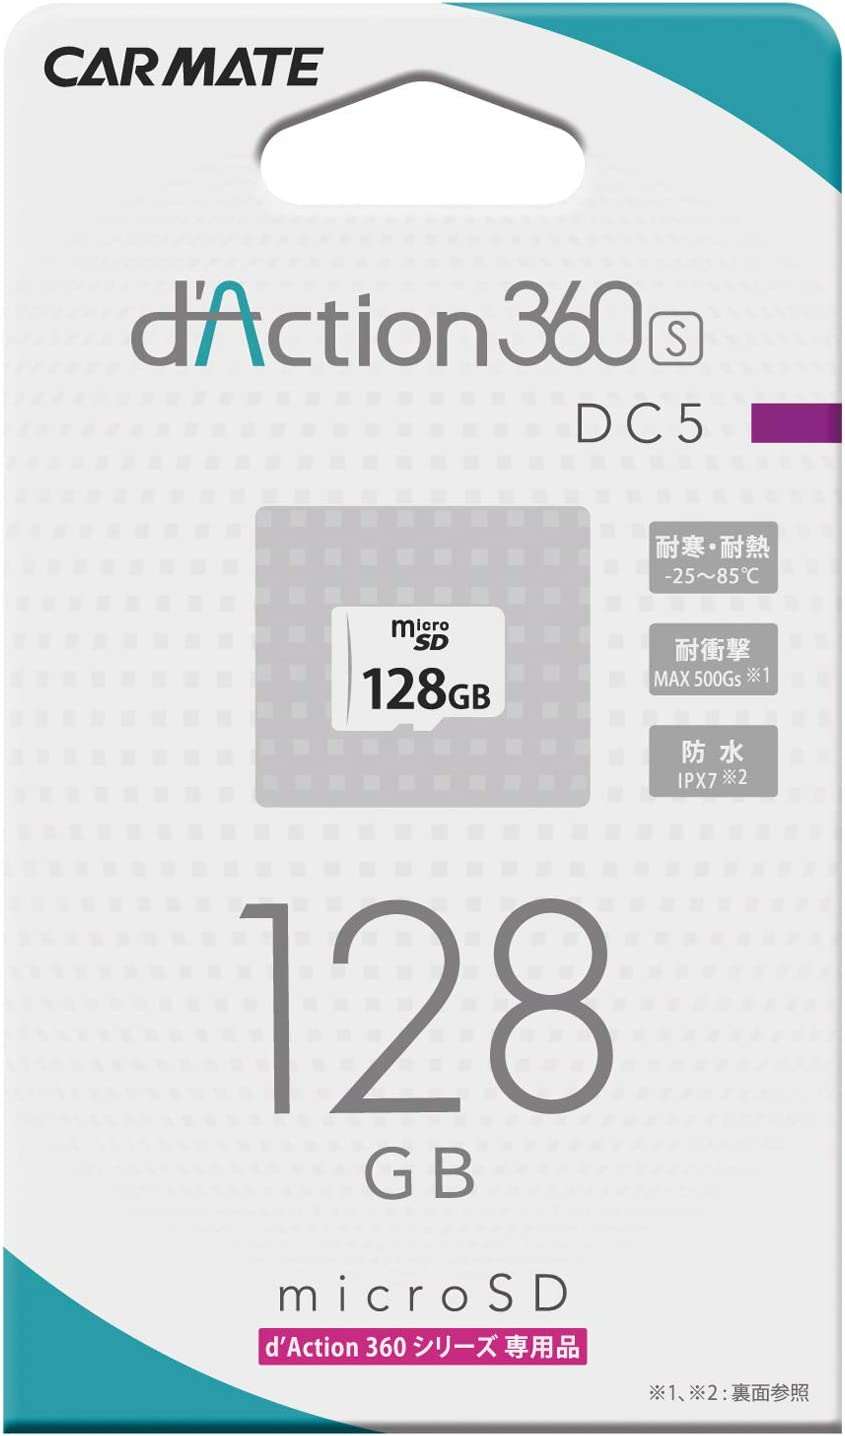 DC5A 128GB shopping MicroSD Card Max 80% OFF Memory